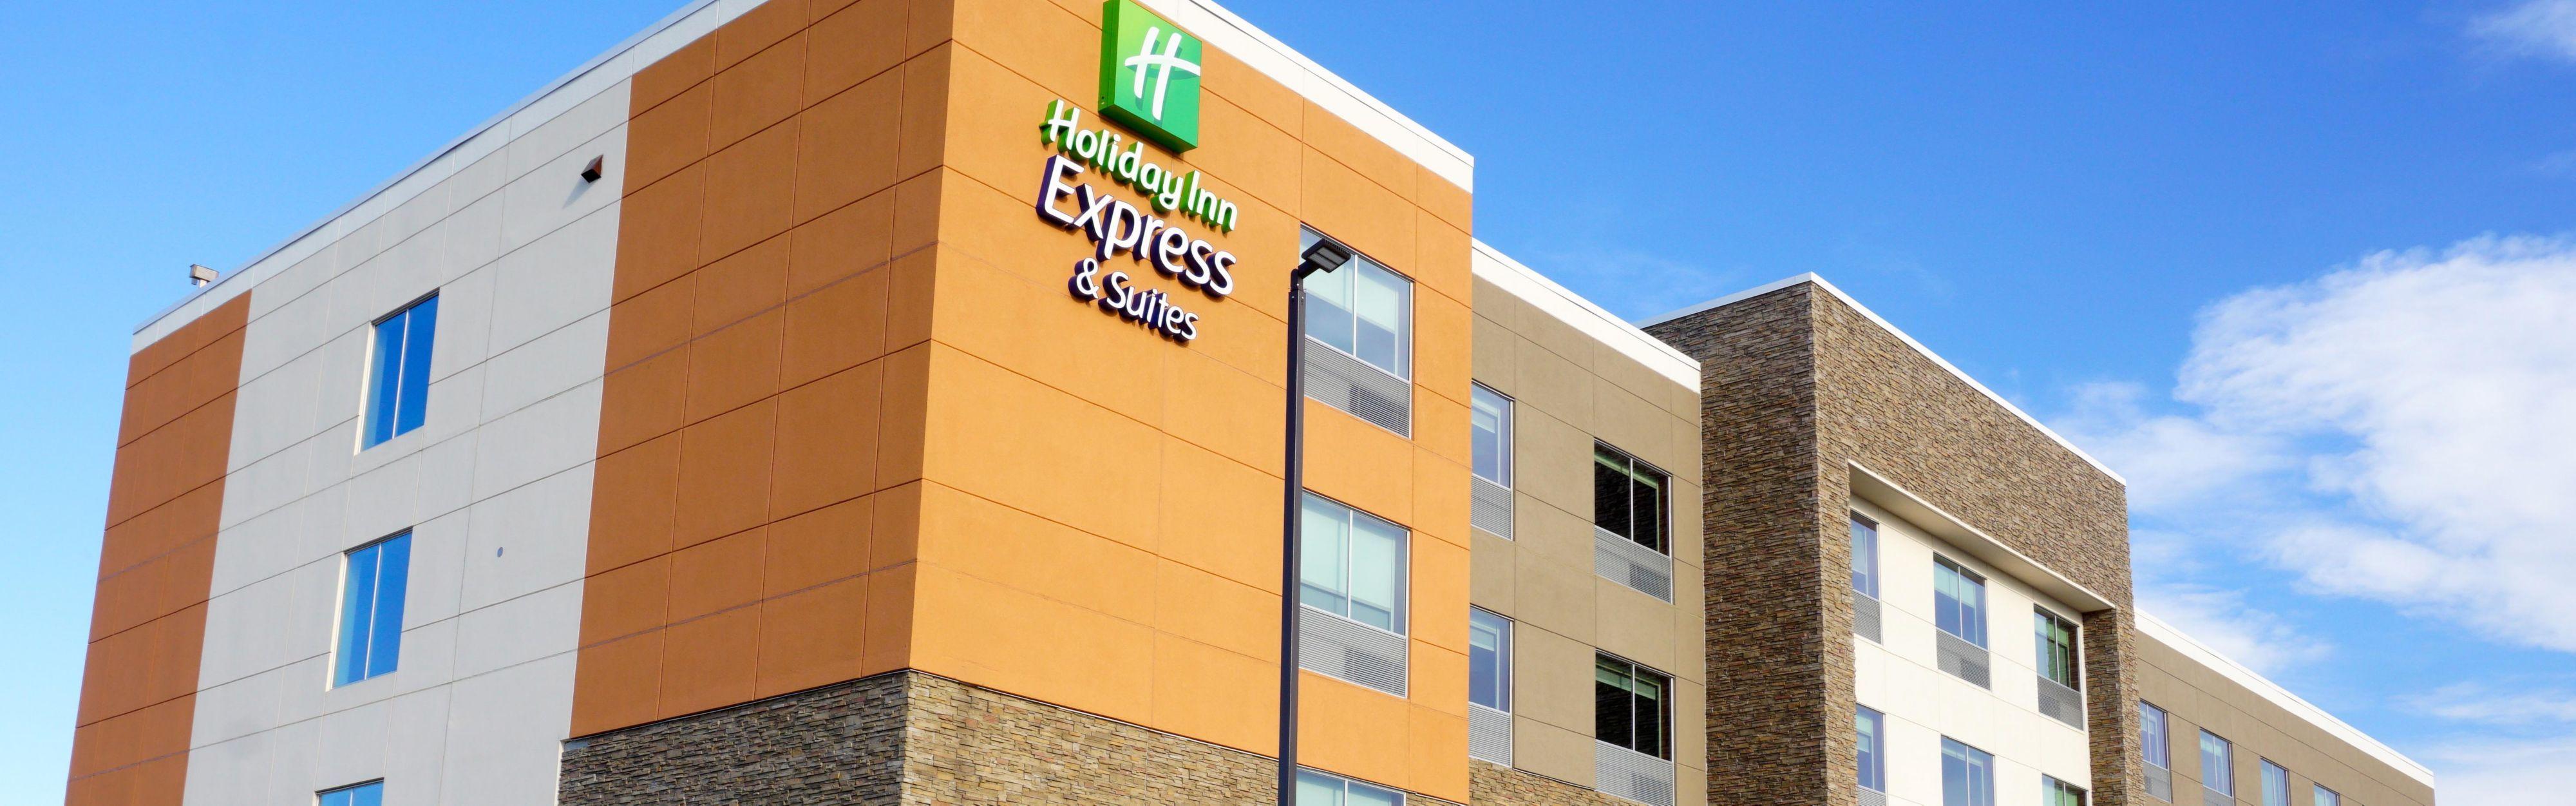 Holiday Inn Express & Suites Omaha - Millard Area image 0